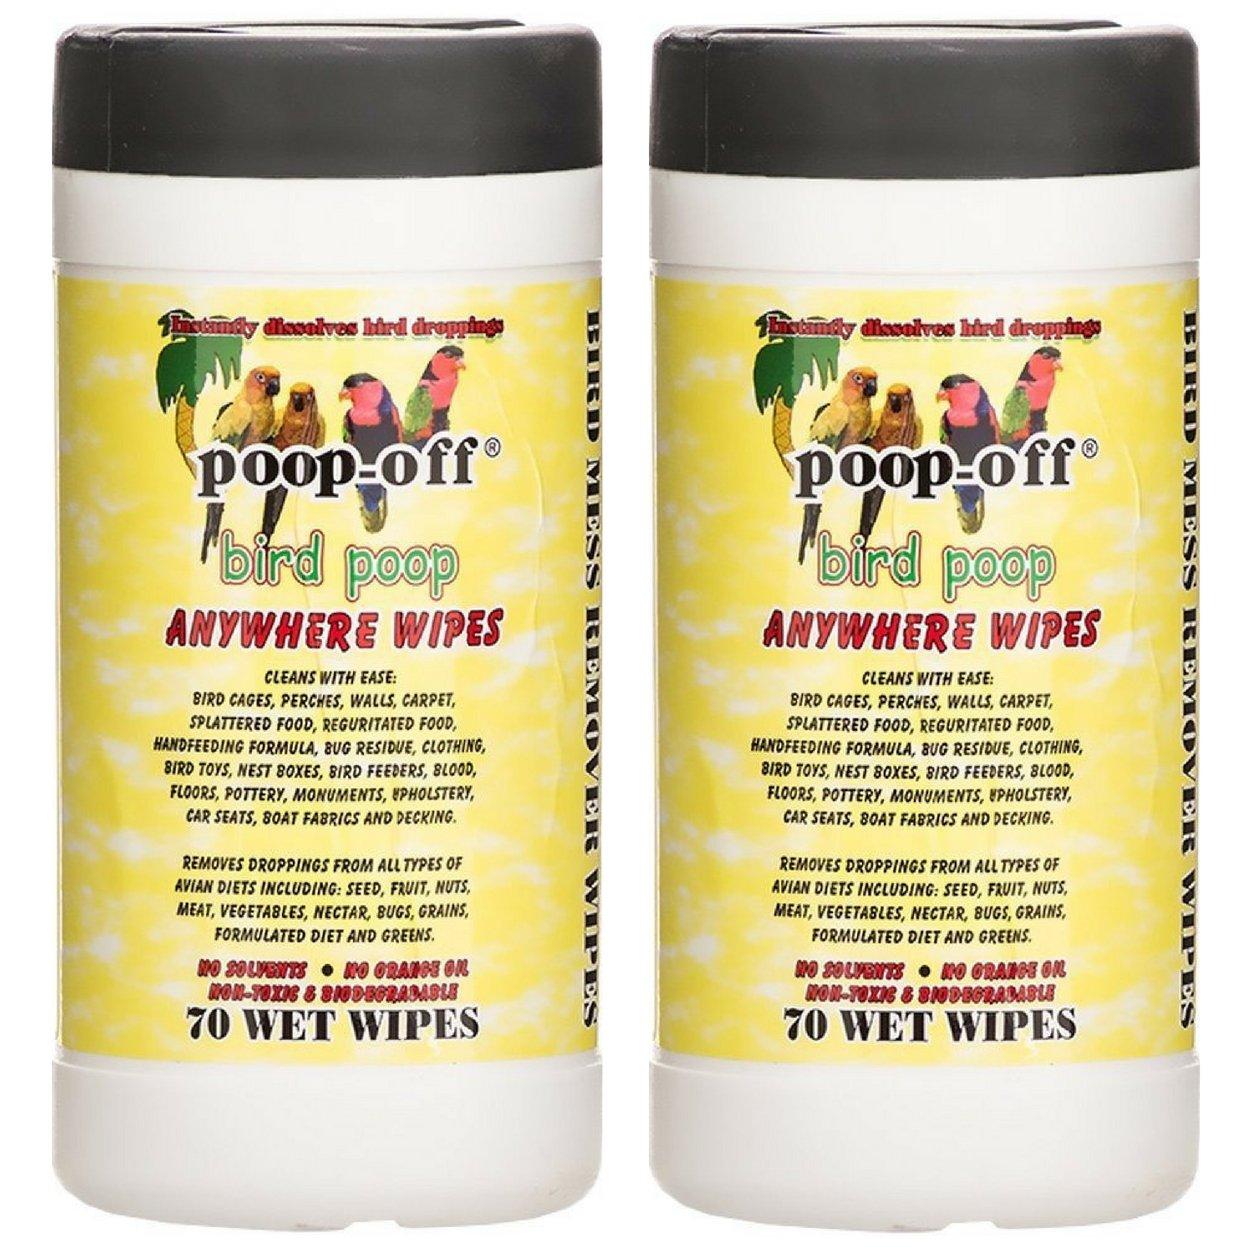 Ames Poop-Off Anywhere Bird Poop Remover Wet Wipes, Set of 70 (2 Pack)